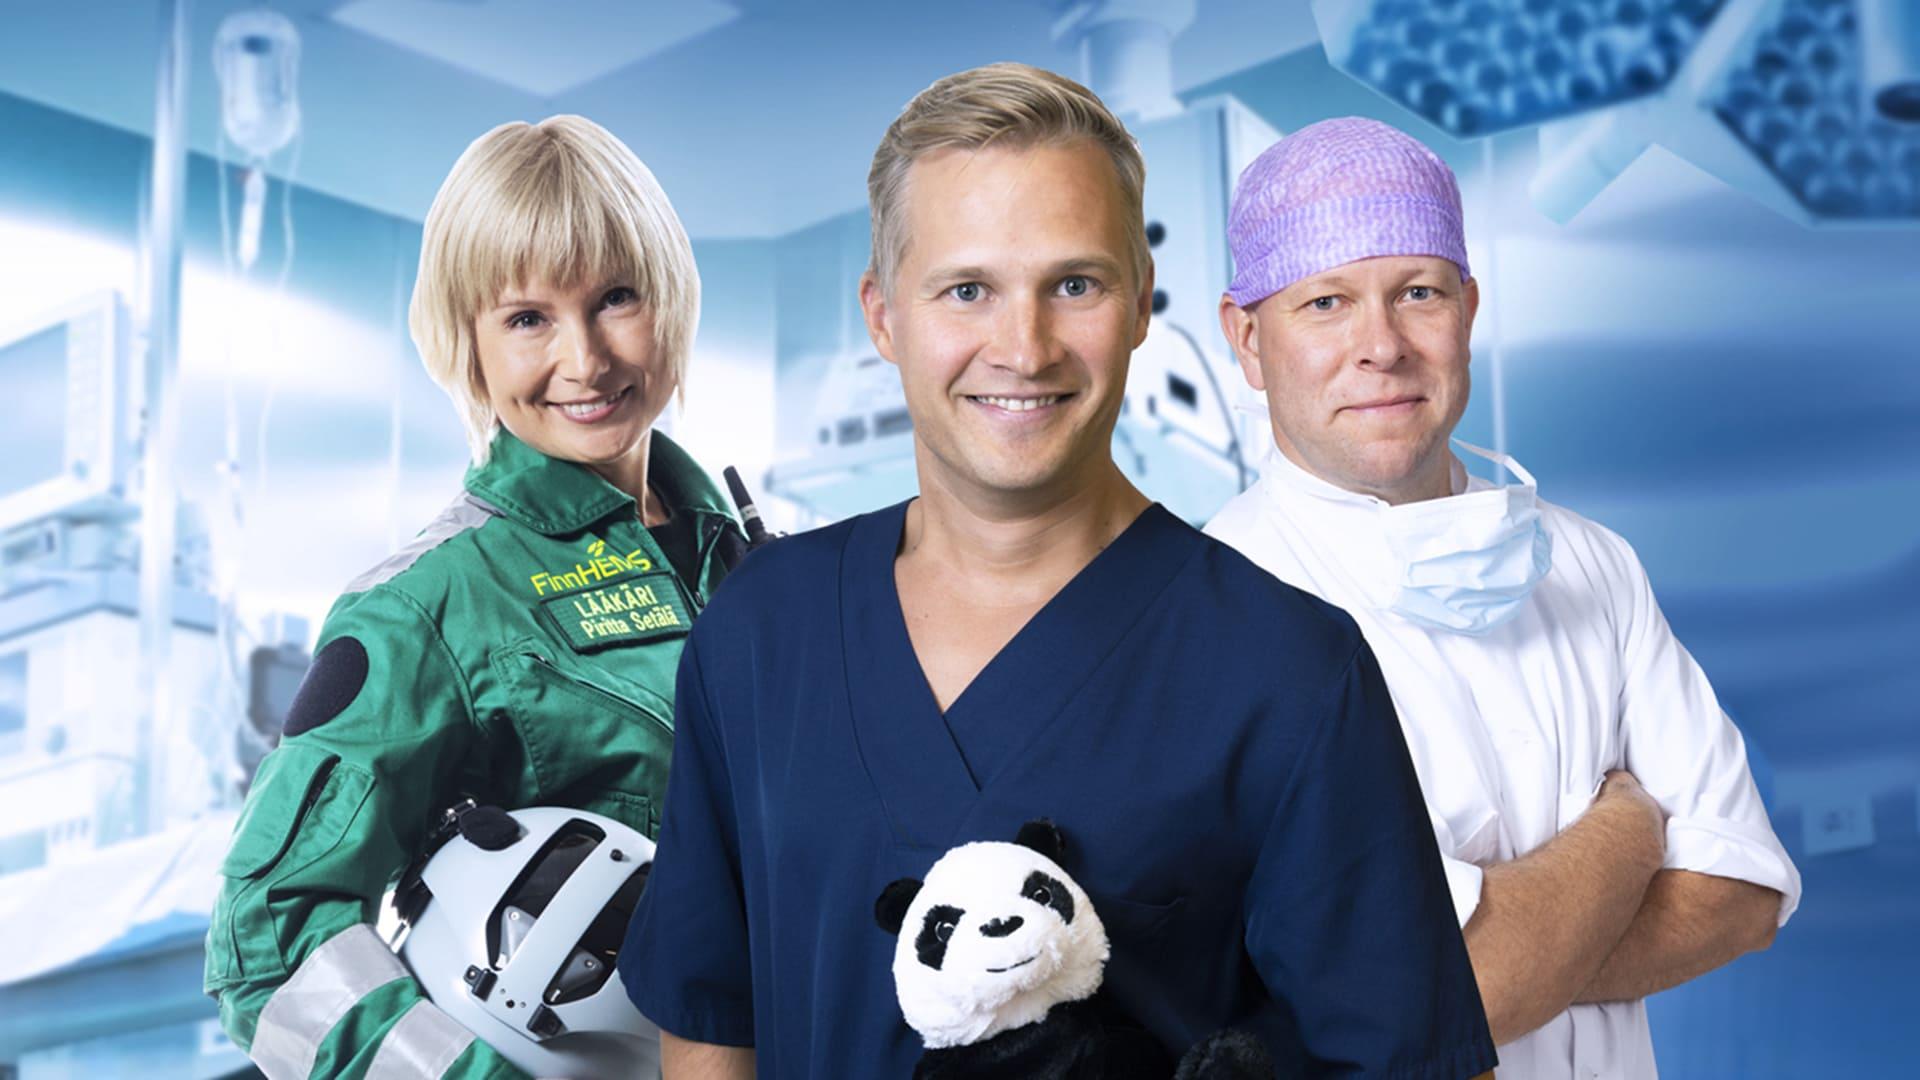 Sarjan uudet jaksot 6.1 alkaen | Elossa 24h | TV | Areena | yle.fi